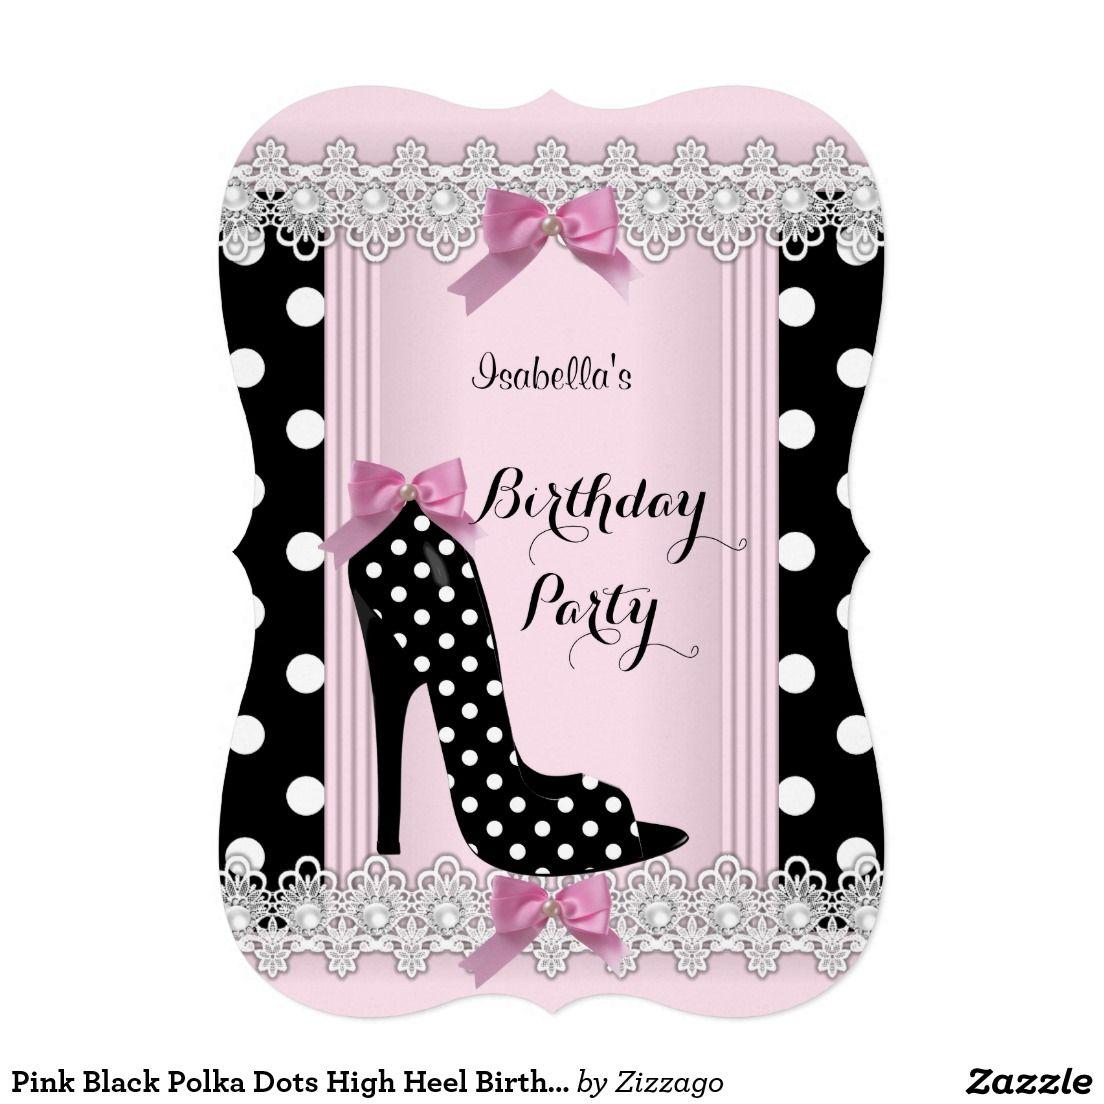 Pink Black Polka Dots High Heel Birthday Party Card | Pink black ...